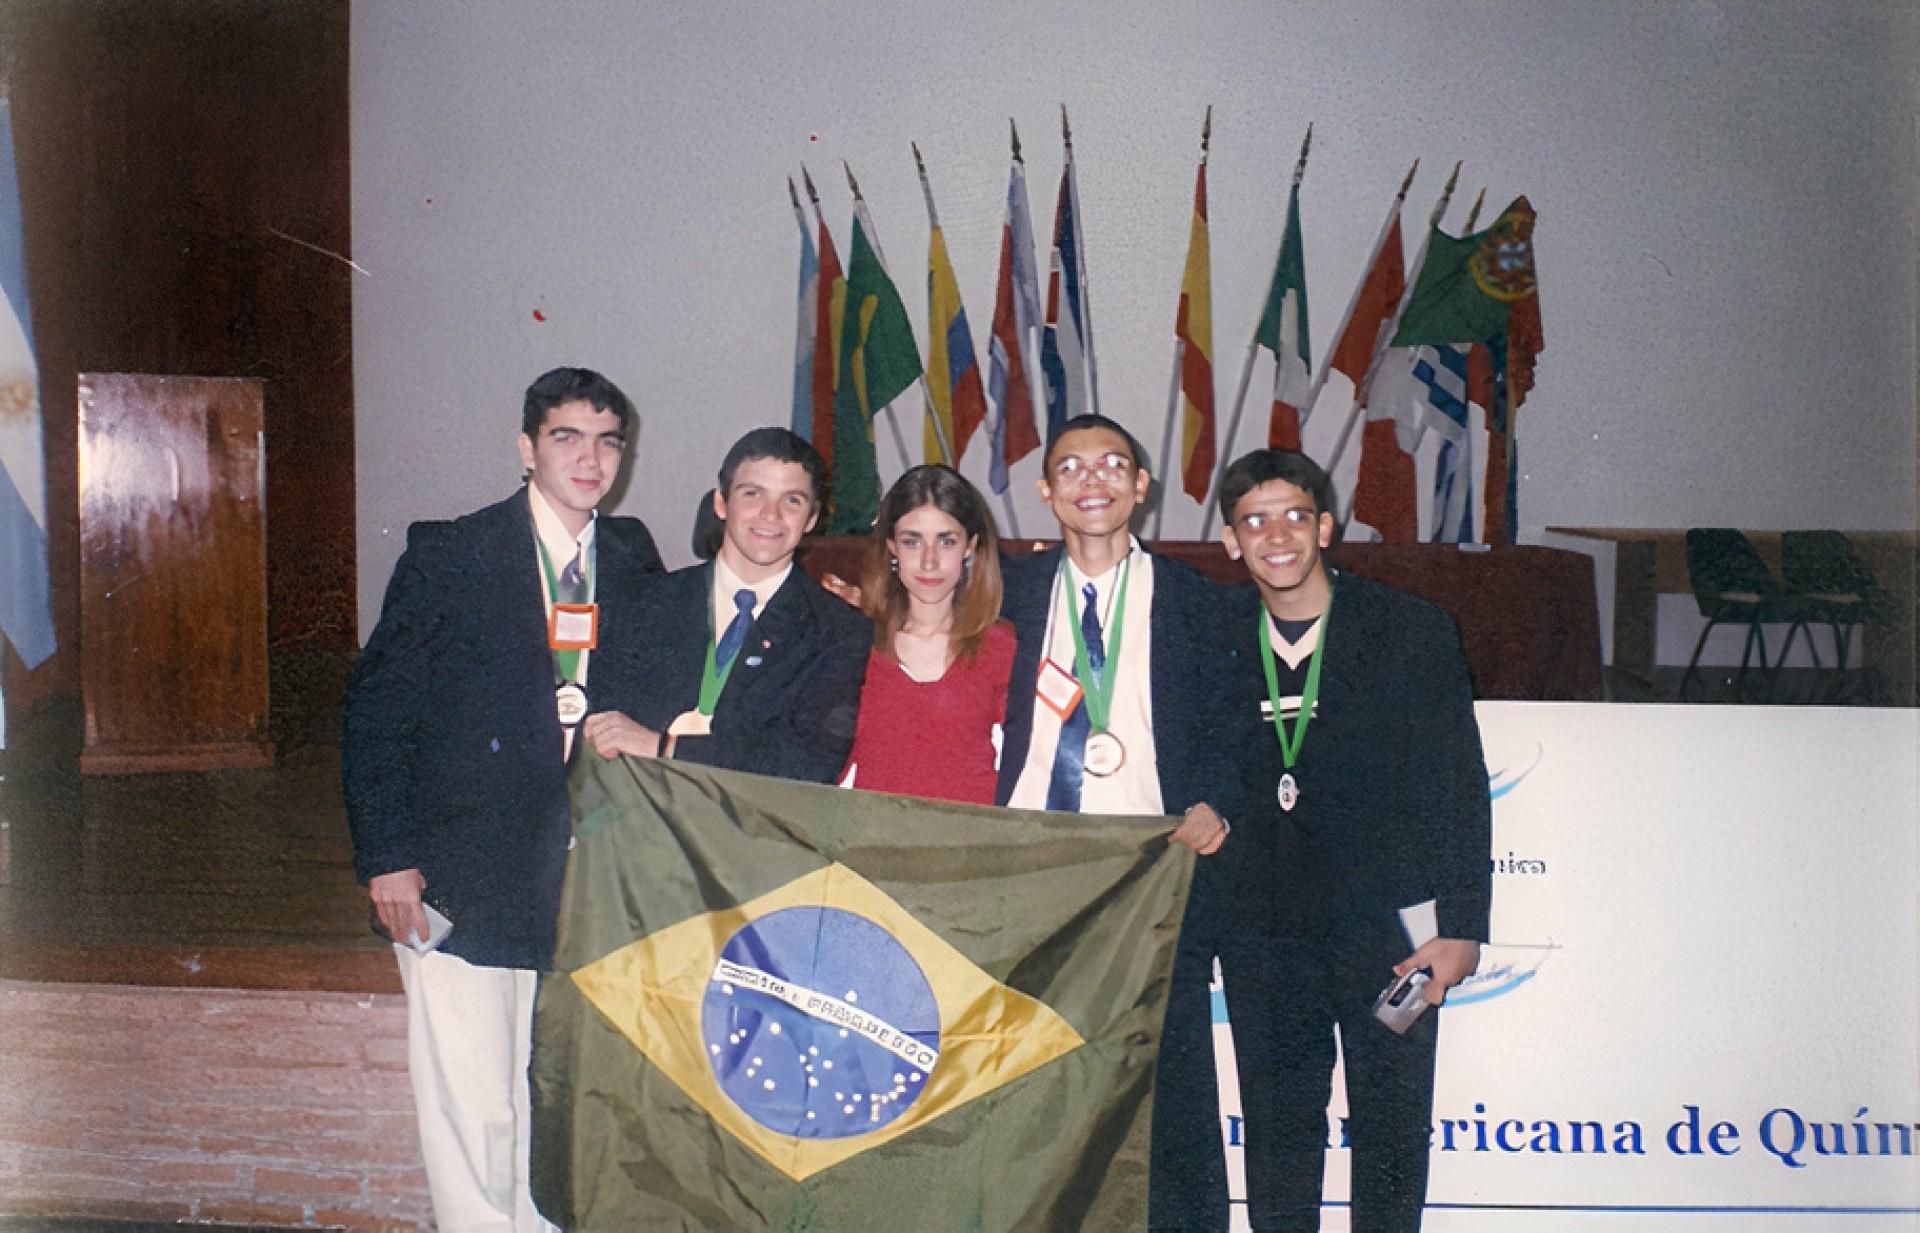 Registro pessoal do medalhista Arquimedes Oliveira, durante a Olimpíada Ibero-americana de Química (Mar del Plata, na Argentina, em 2002)